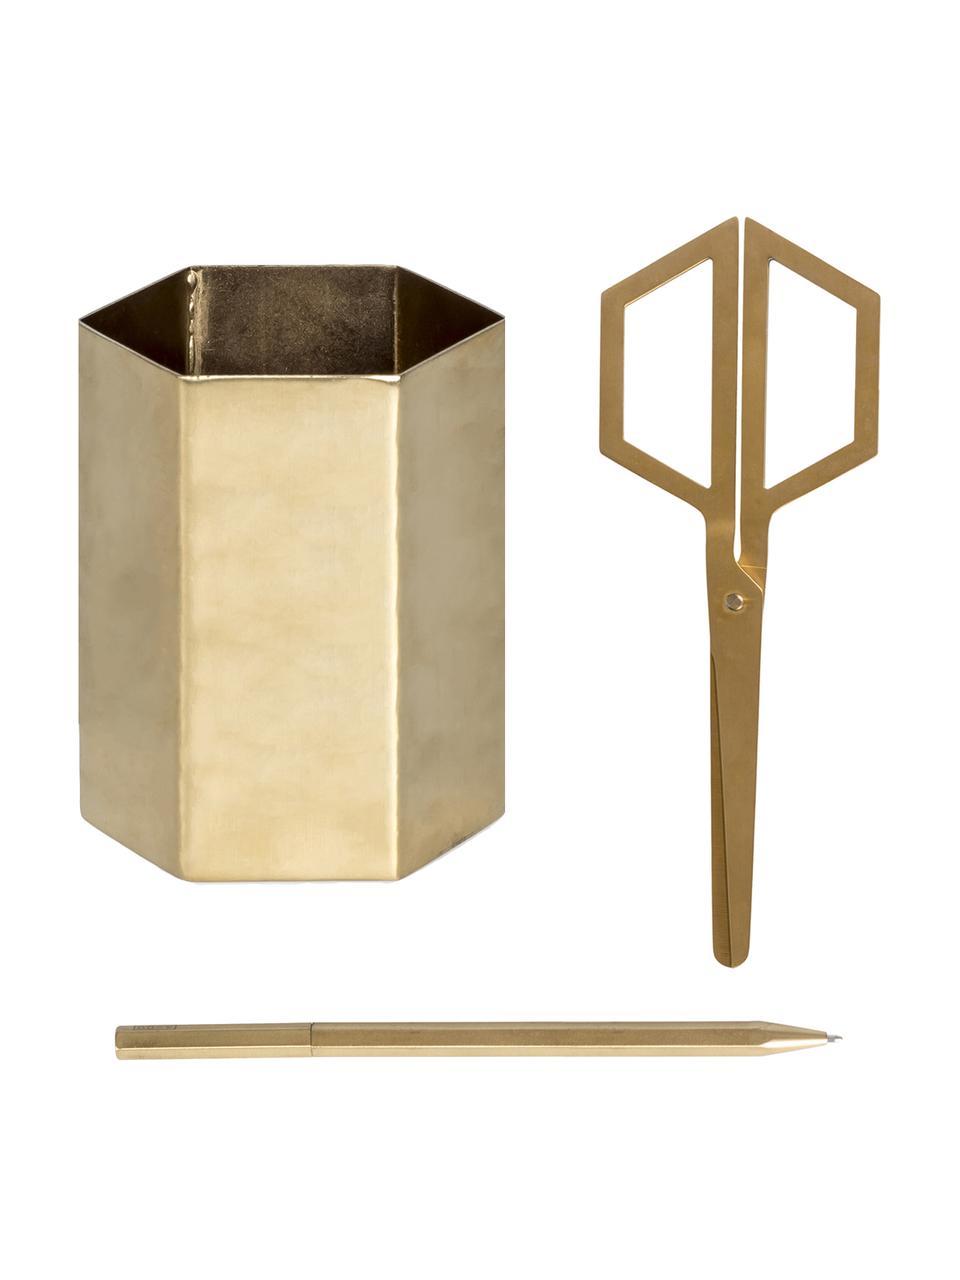 Büro-Set Hex, 3-tlg., Edelstahl, beschichtet, Goldfarben, Sondergrößen